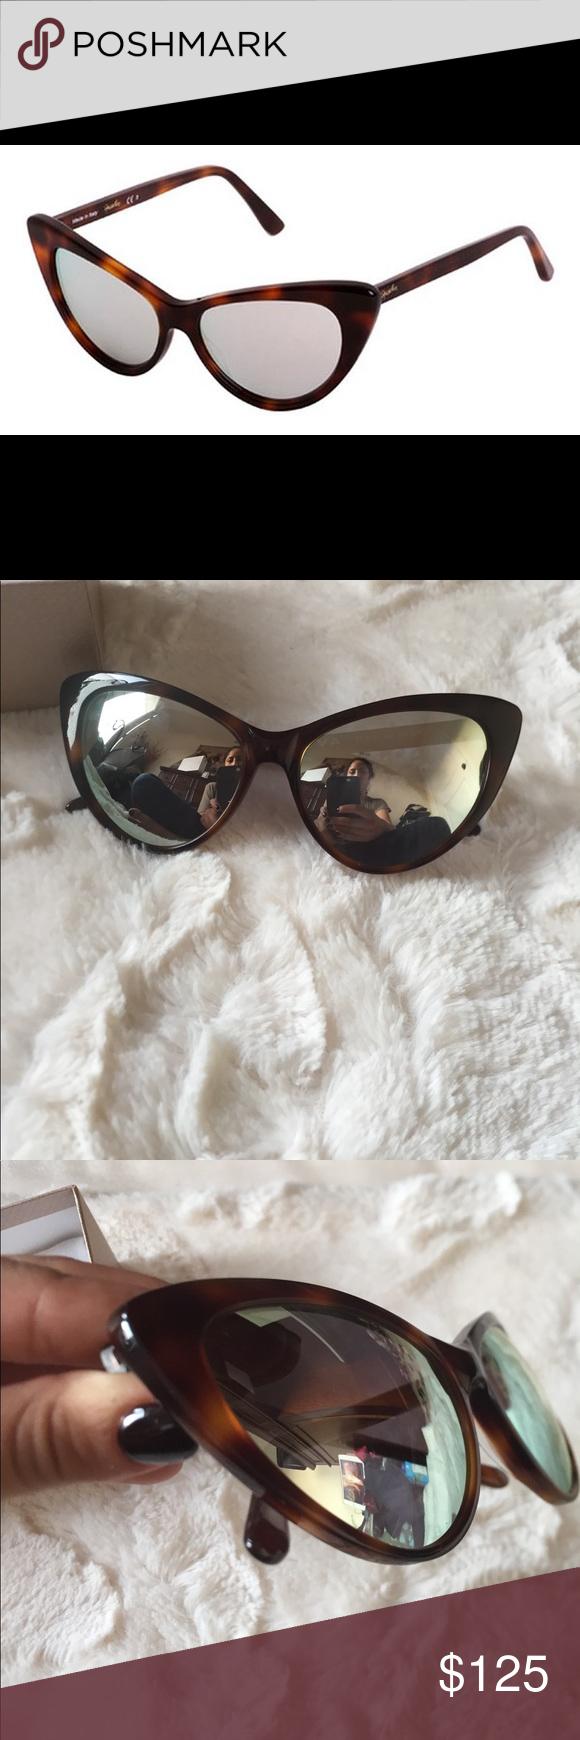 b2fa4d1cb479 Spektre Sunglasses Brand new with case. Eva. Mirror lens. Tortoise shell  design spektre Accessories Sunglasses